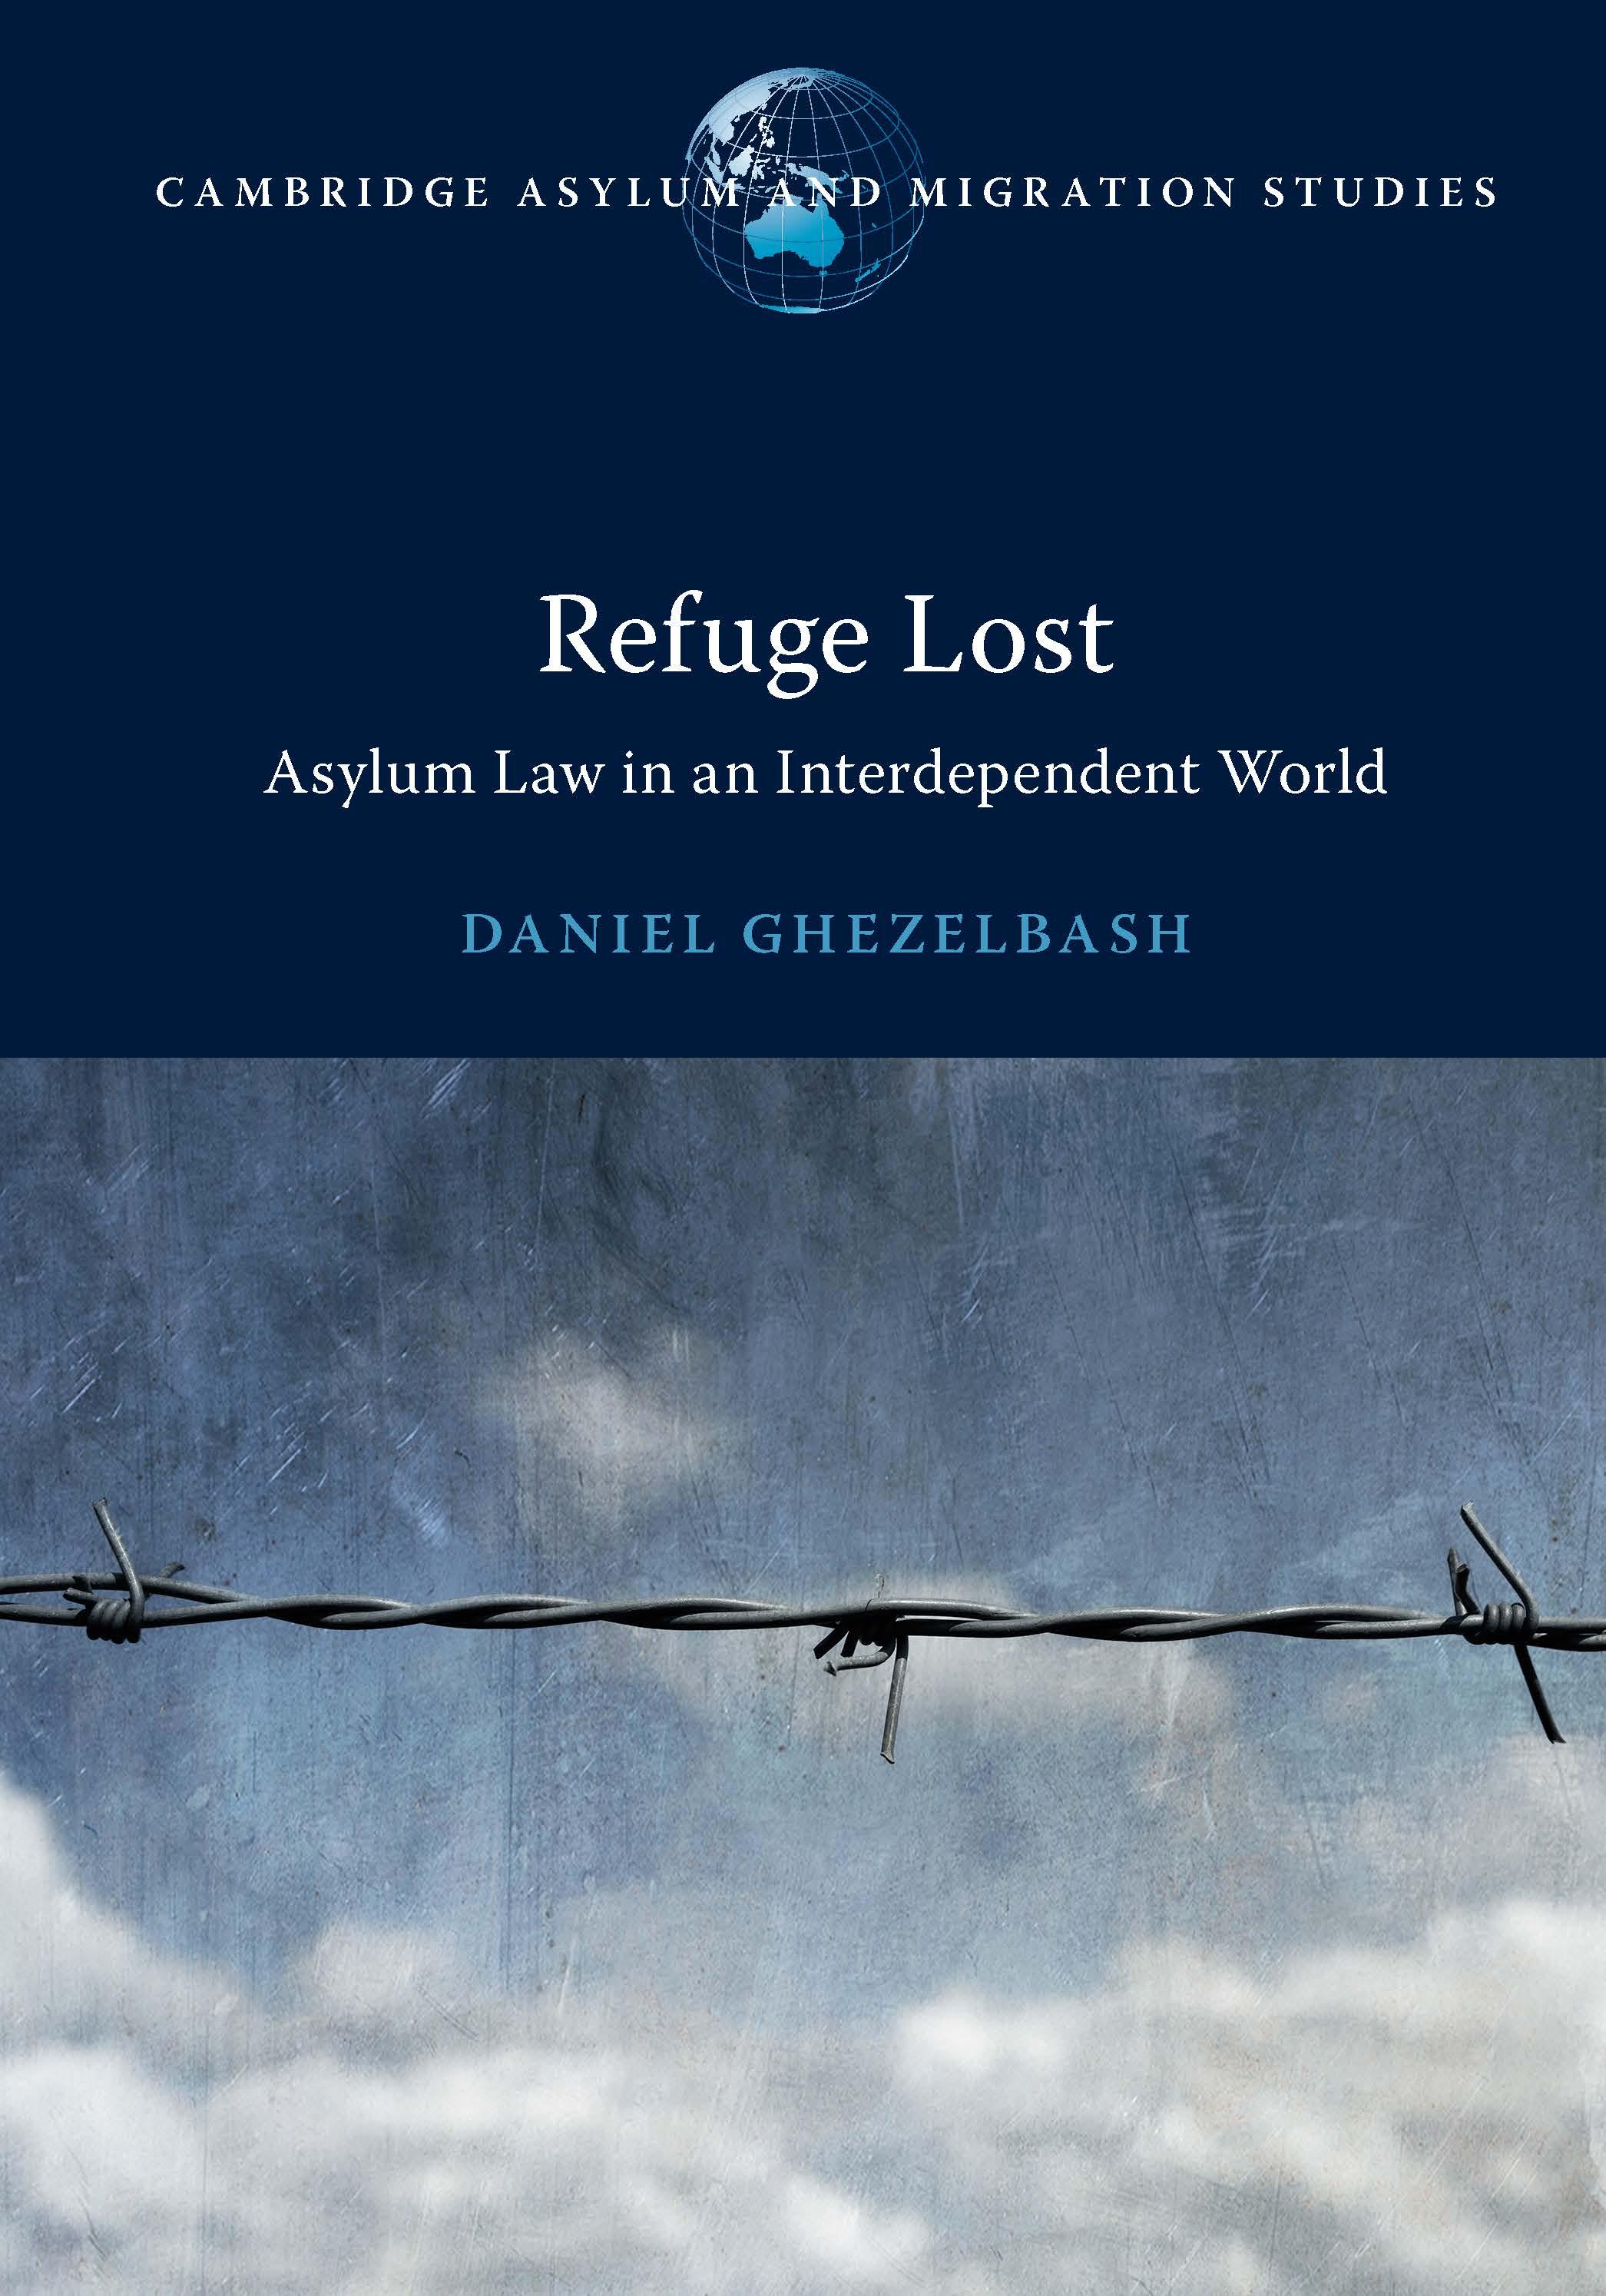 Refuge Lost: Asylum Law in an Interdependent World by Daniel Ghezelbash